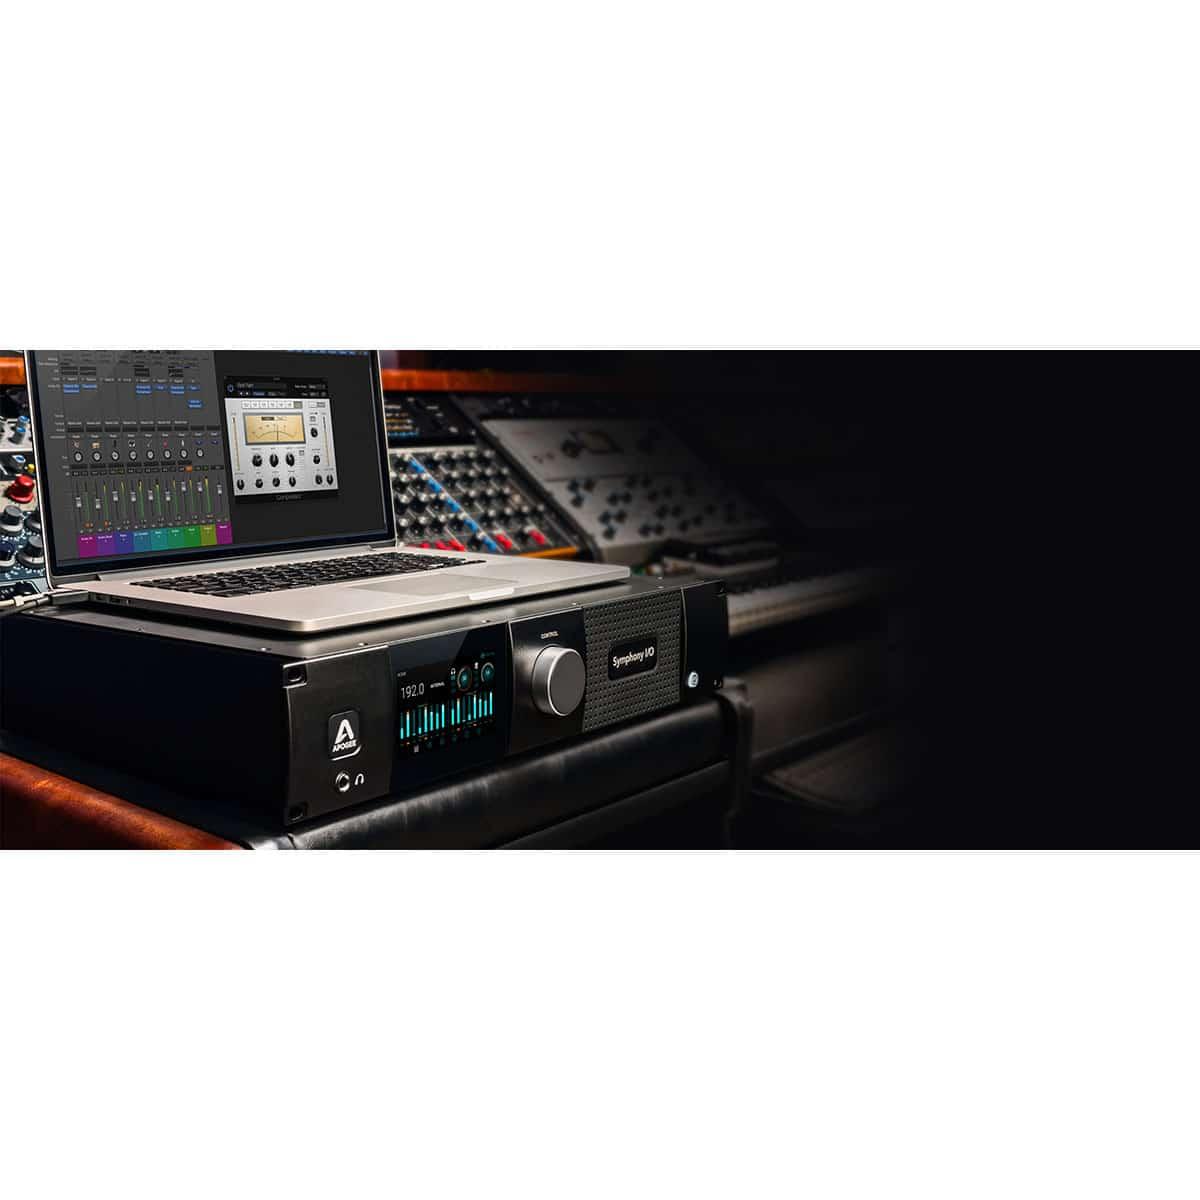 Apogee Symphony mkii 03 Convertitori Audio, Pro Audio, Audio Digitale, Schede Audio per PC e MAC